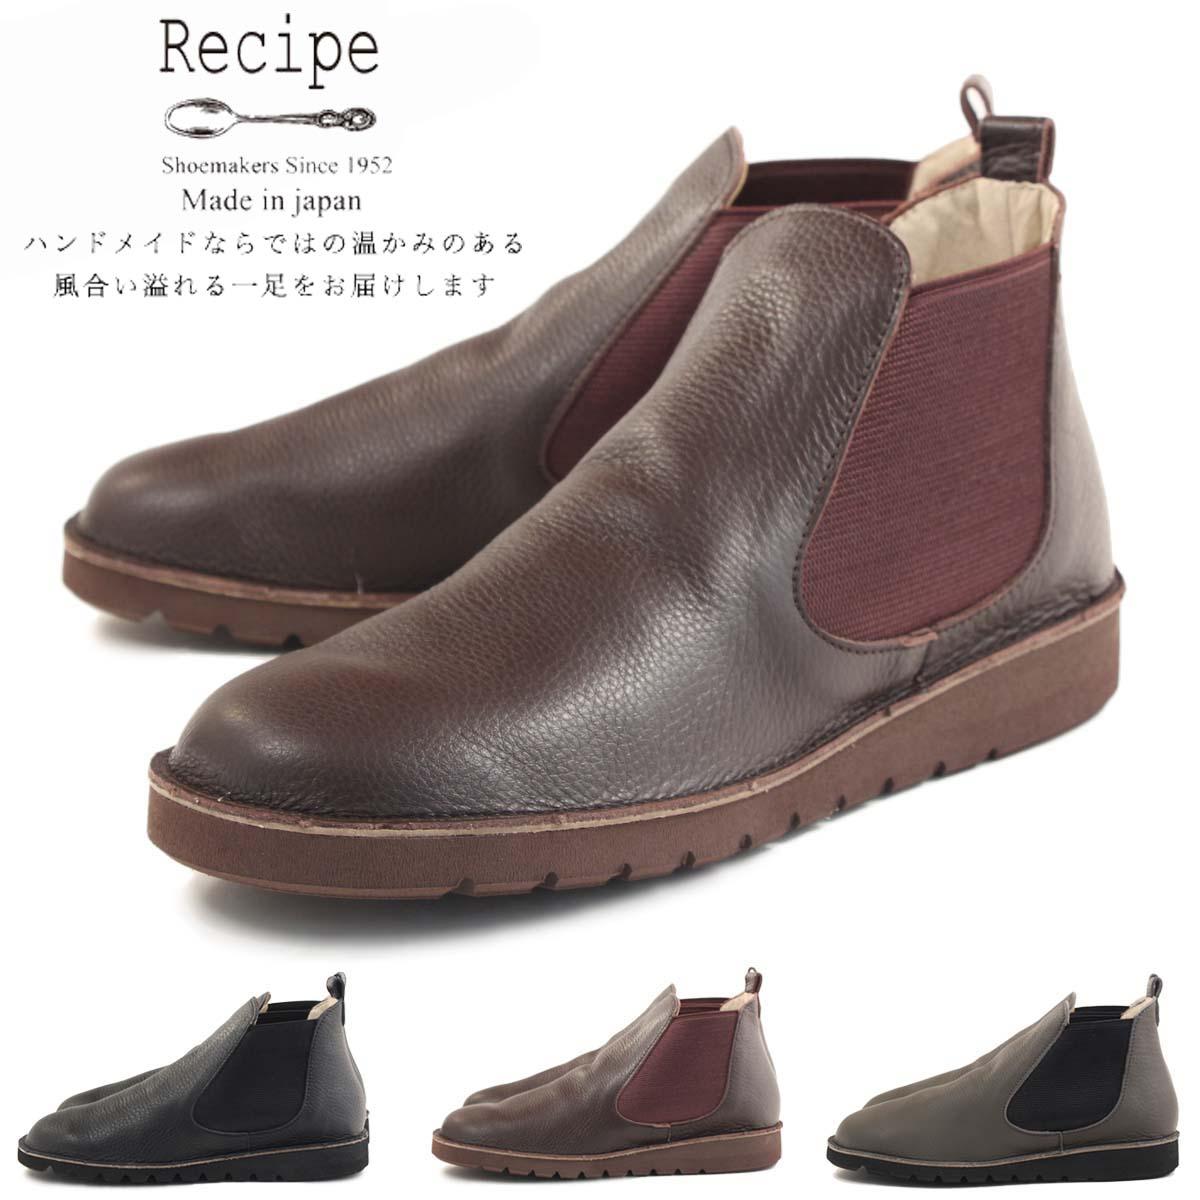 【Recipe レシピ】【ショートブーツ】  超軽量サイドゴアブーツ rp306 【日本製/国産/Made In Japan】